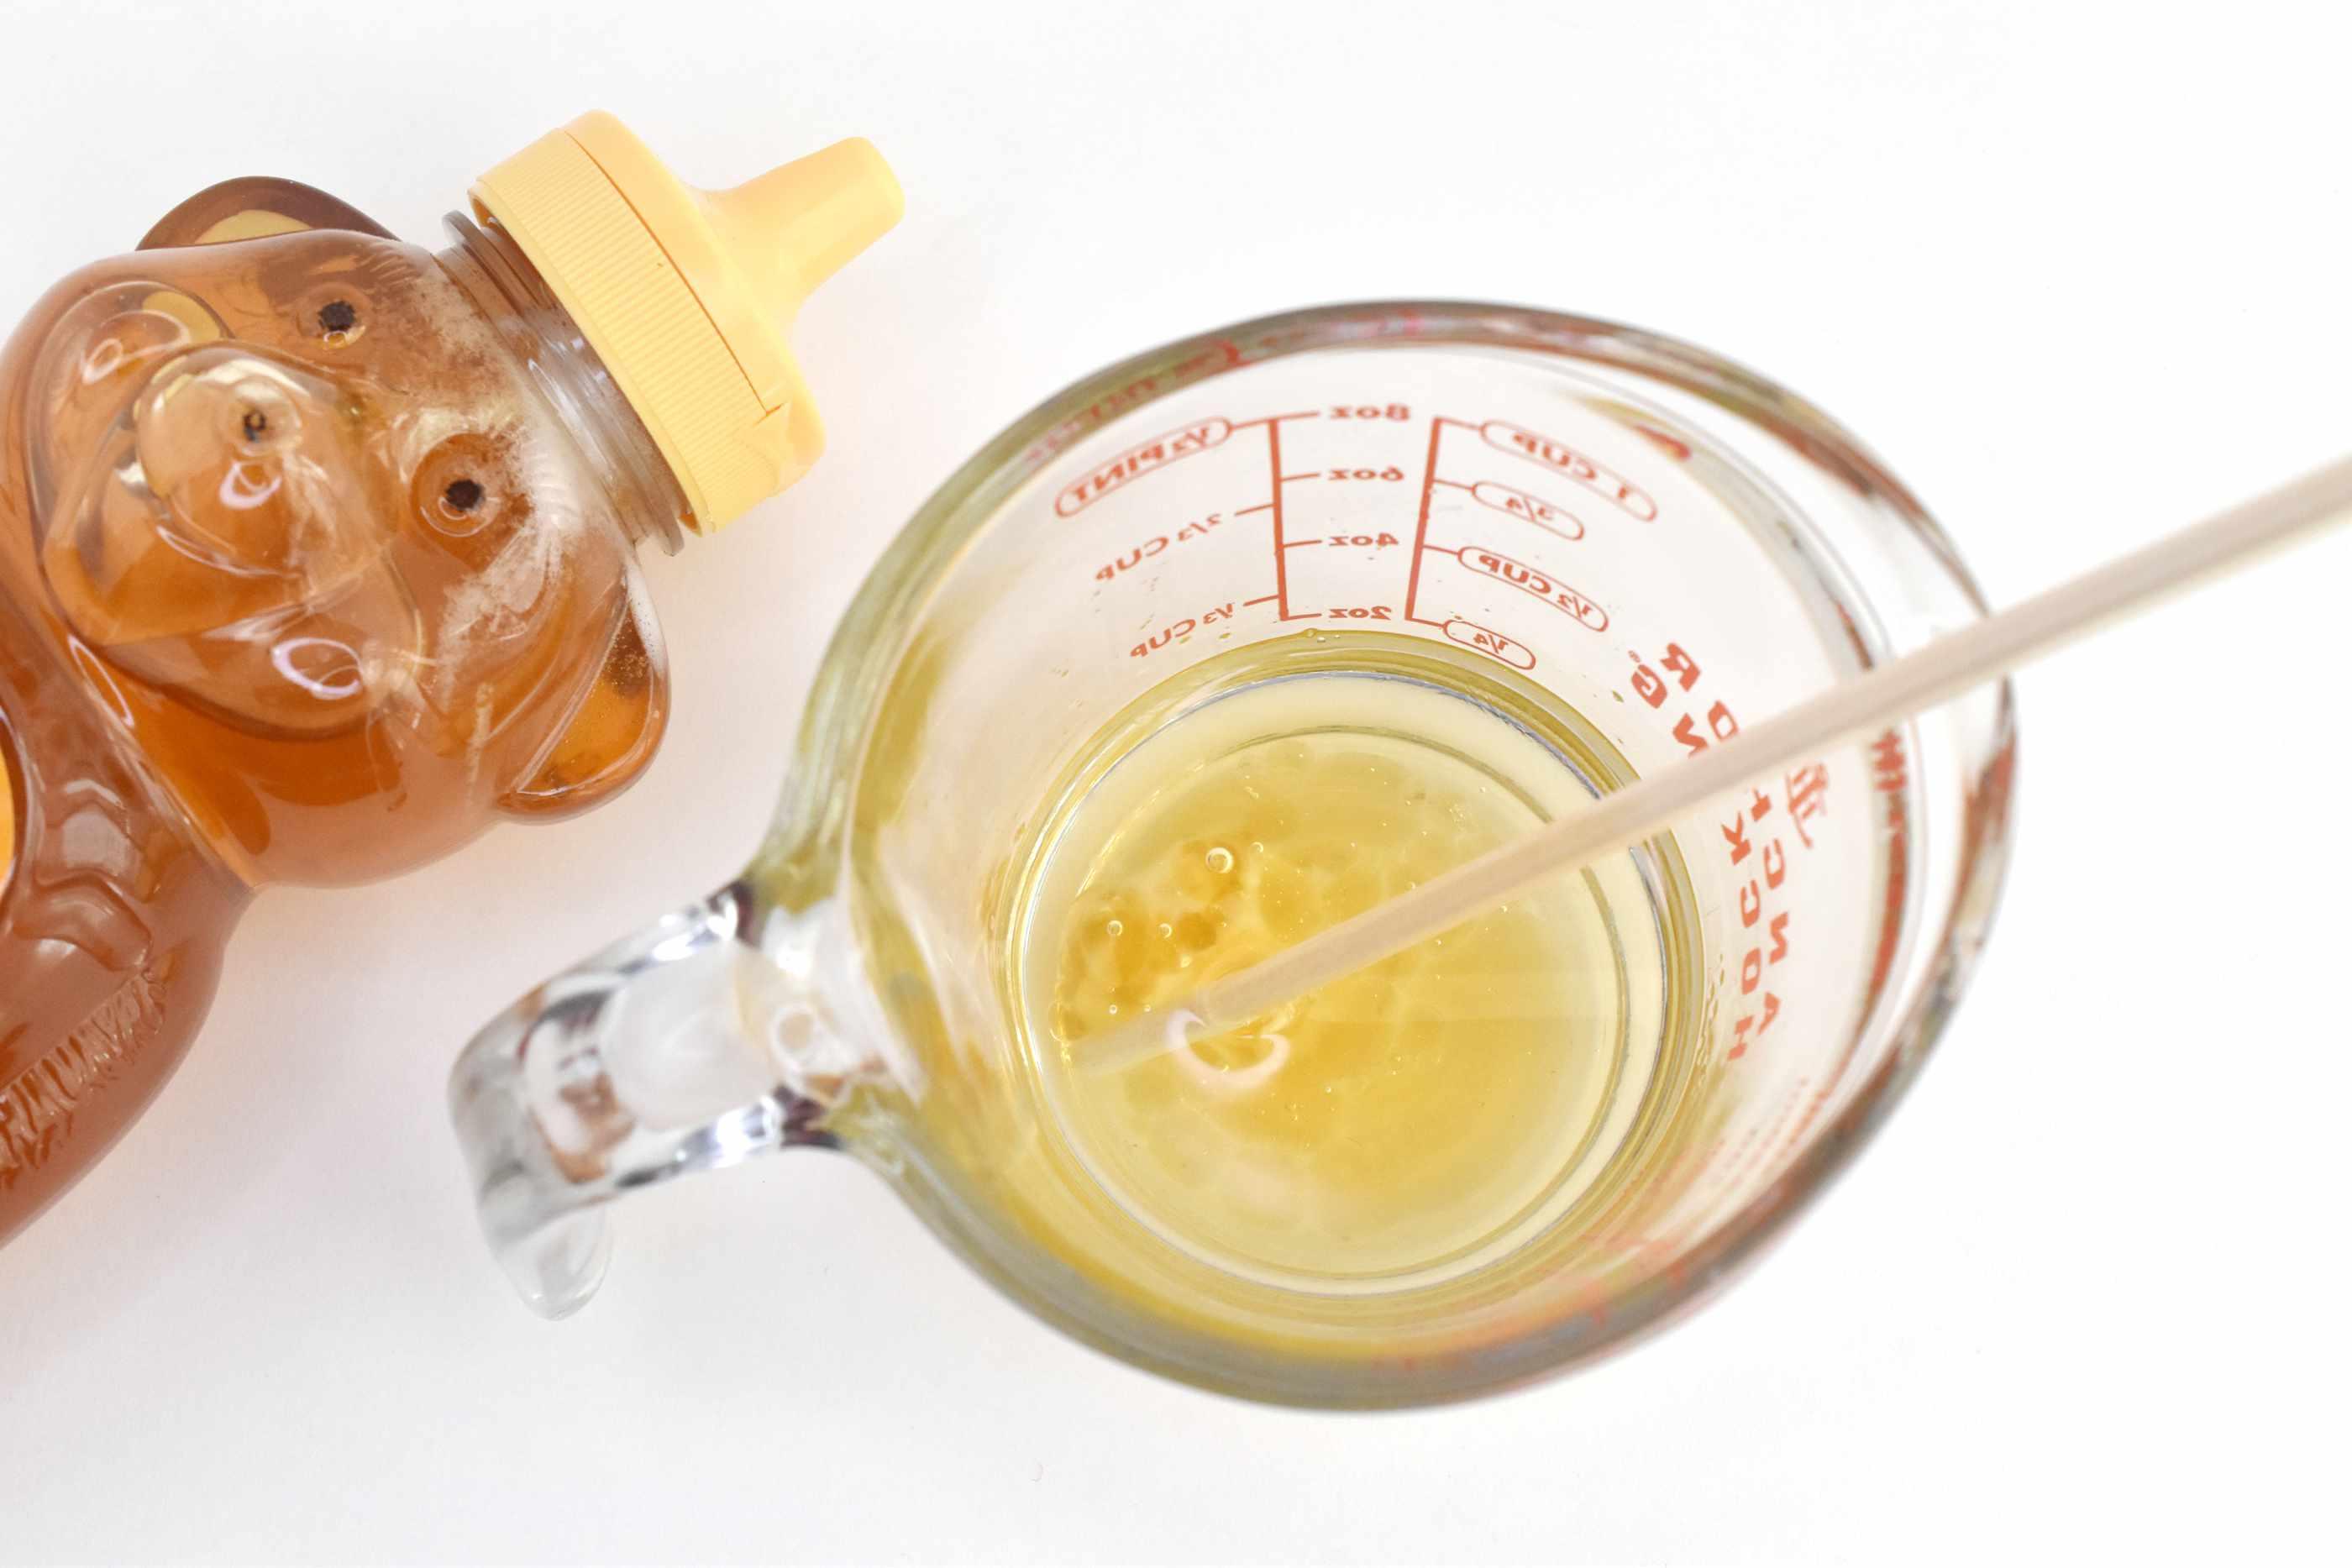 Add Honey to Lip Balm Mixture and Stir Well